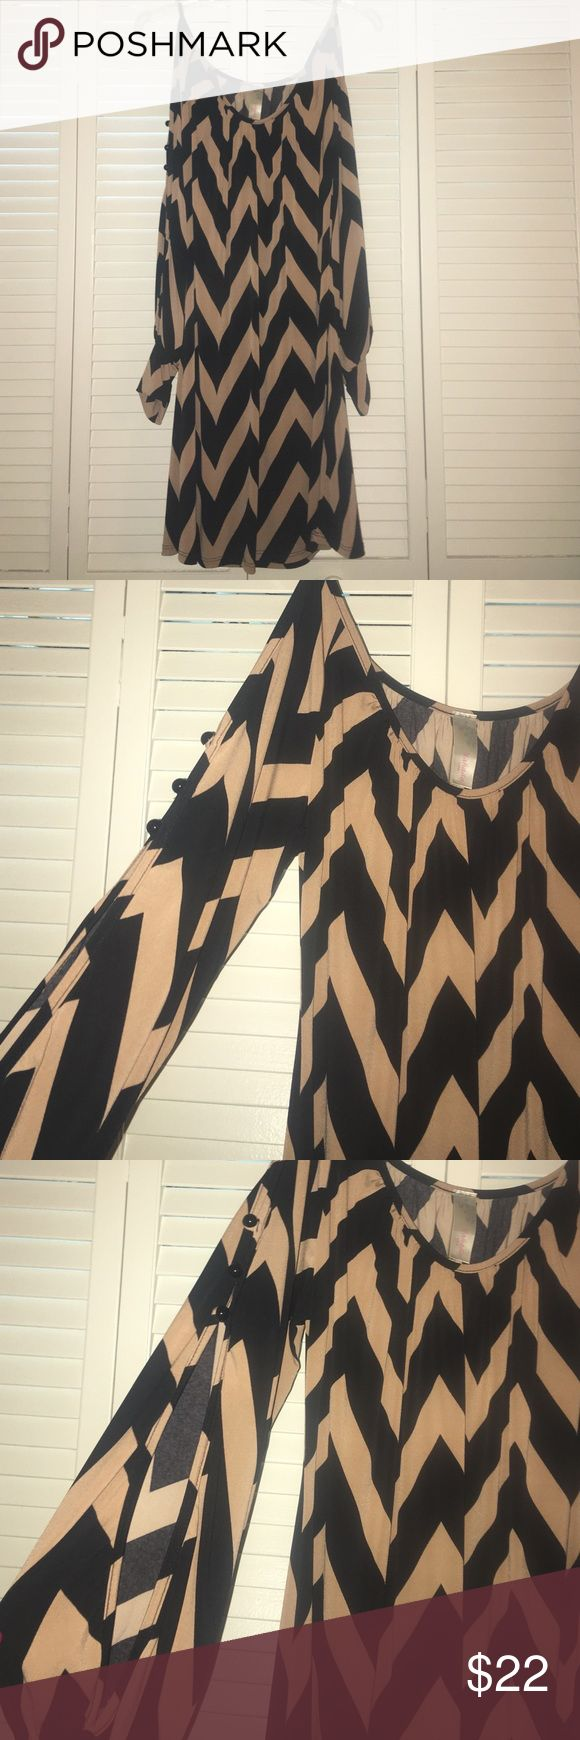 Chevron dress. Navy and tan long sleeve chevron dress with slits down the arms. Dresses Mini